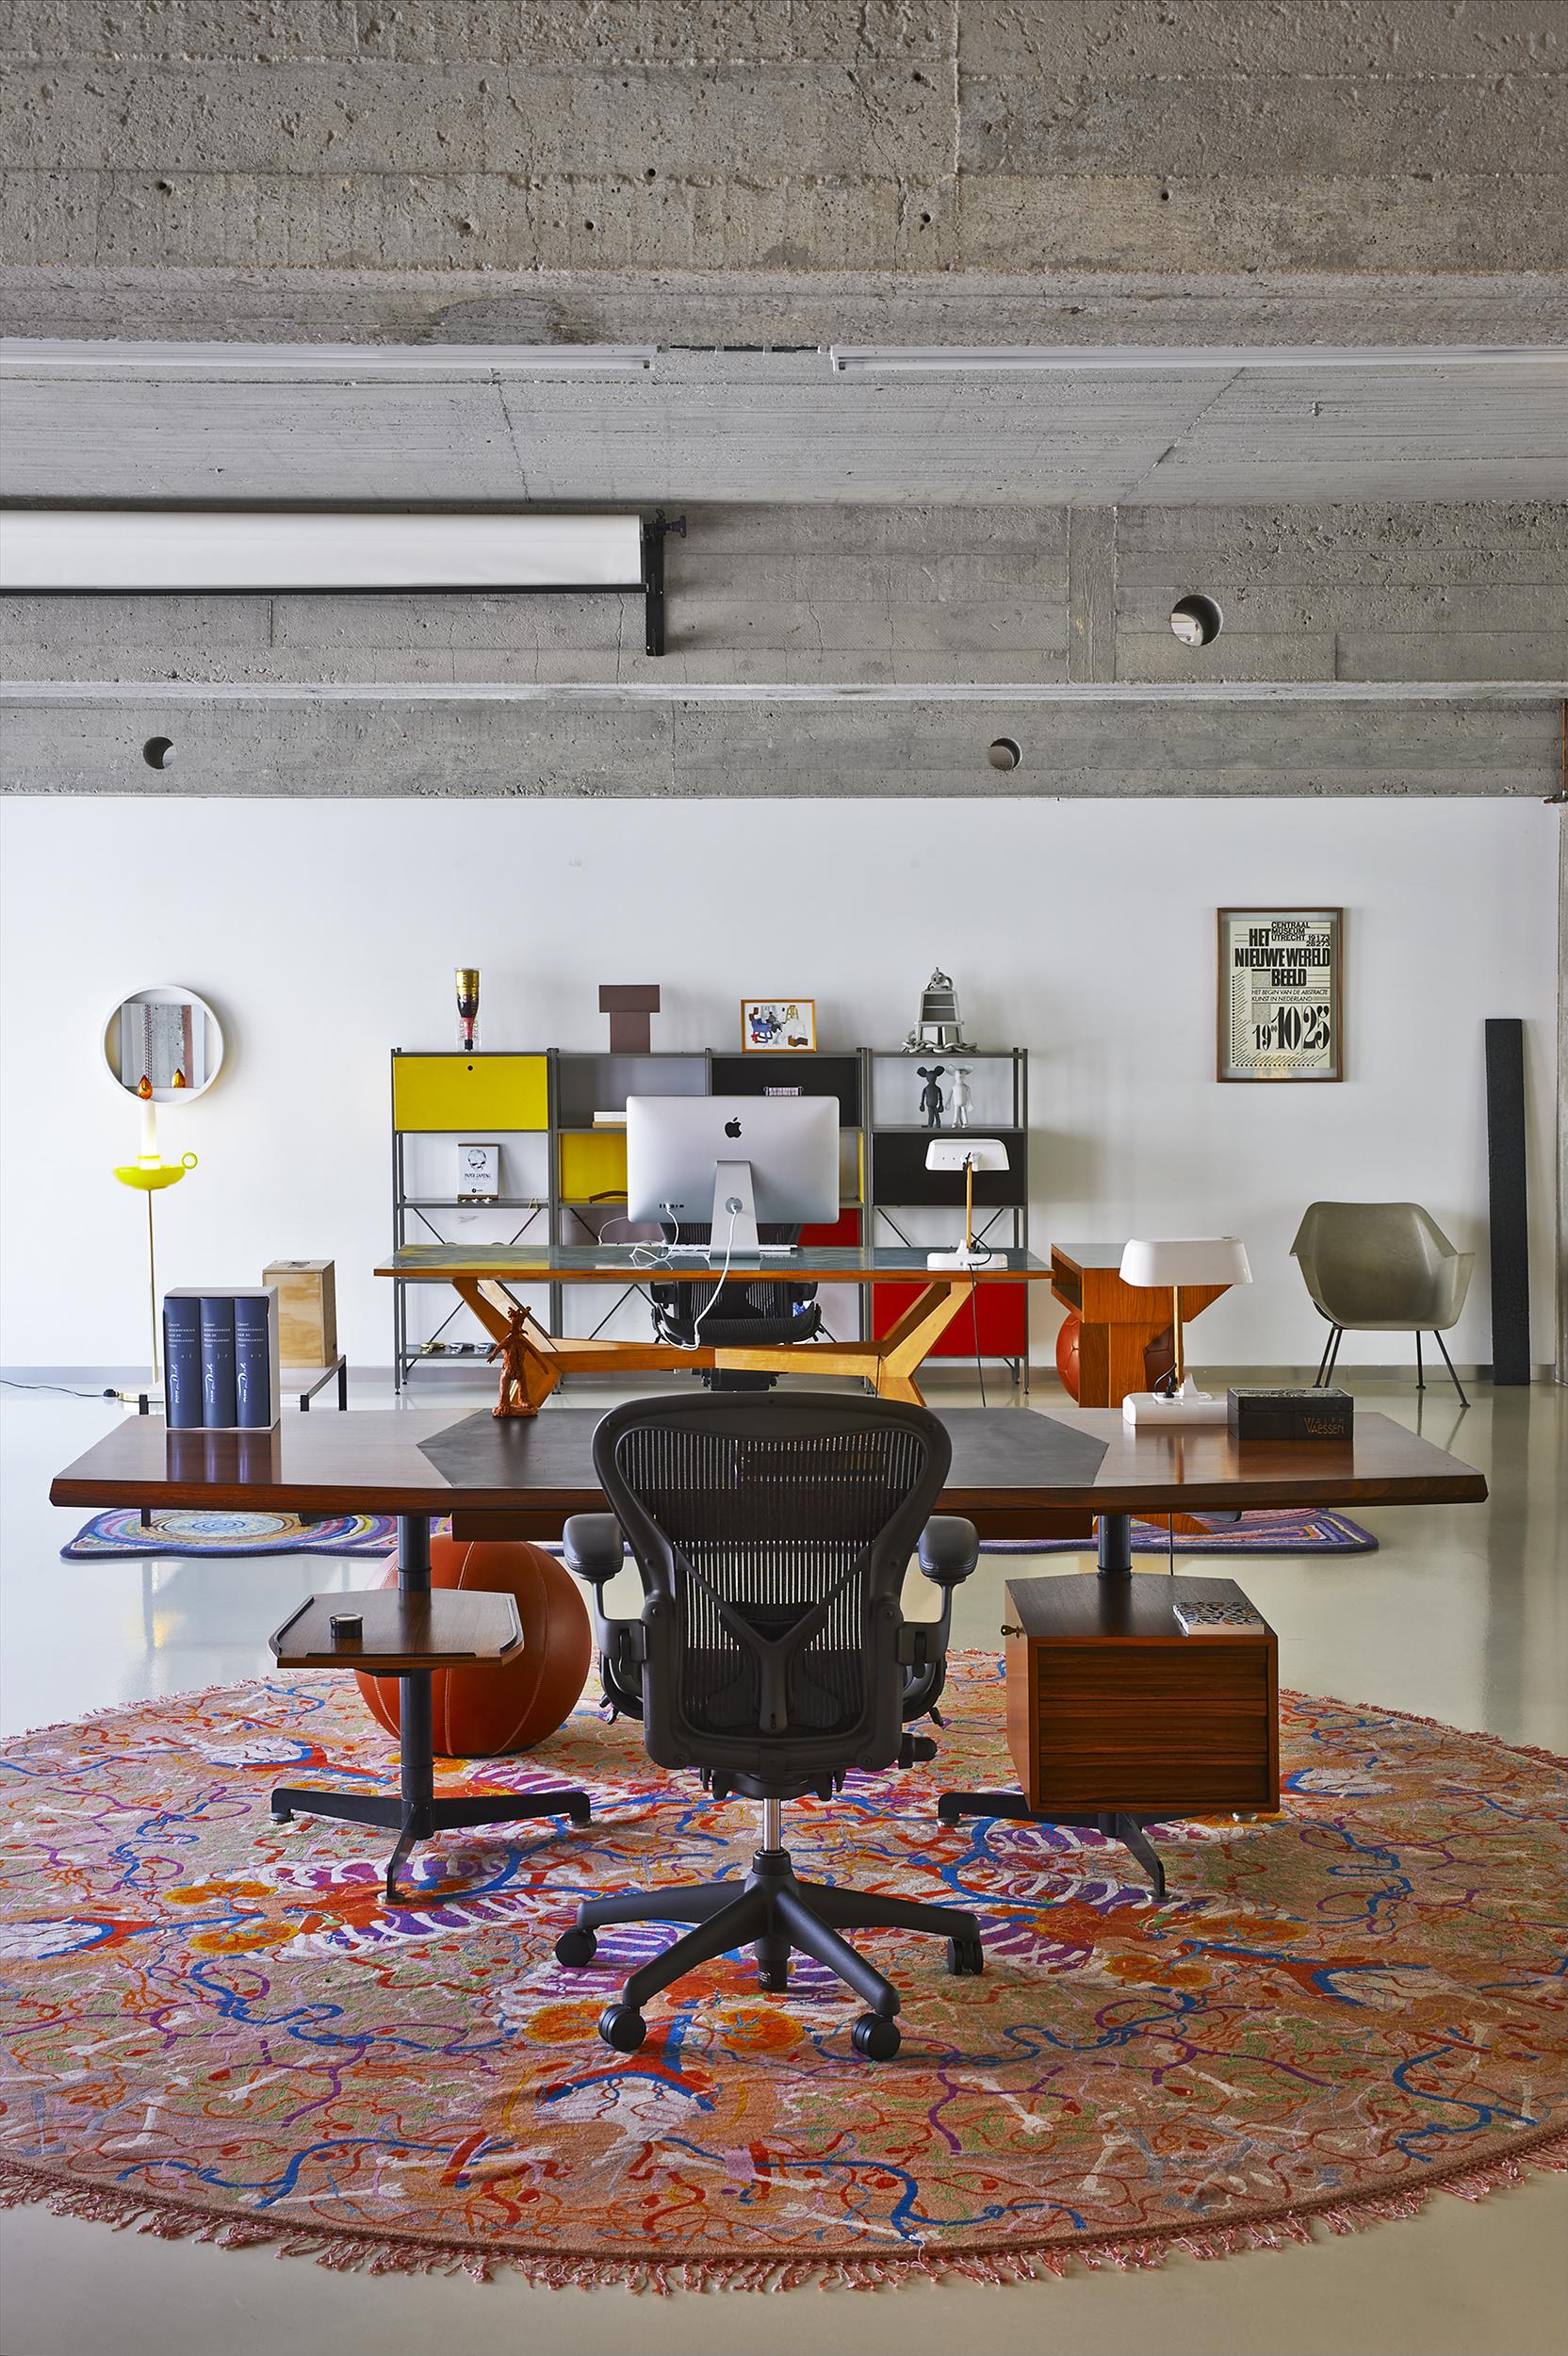 HV-Loft 1st floor office ph Dennis Brandsma 22713 0168